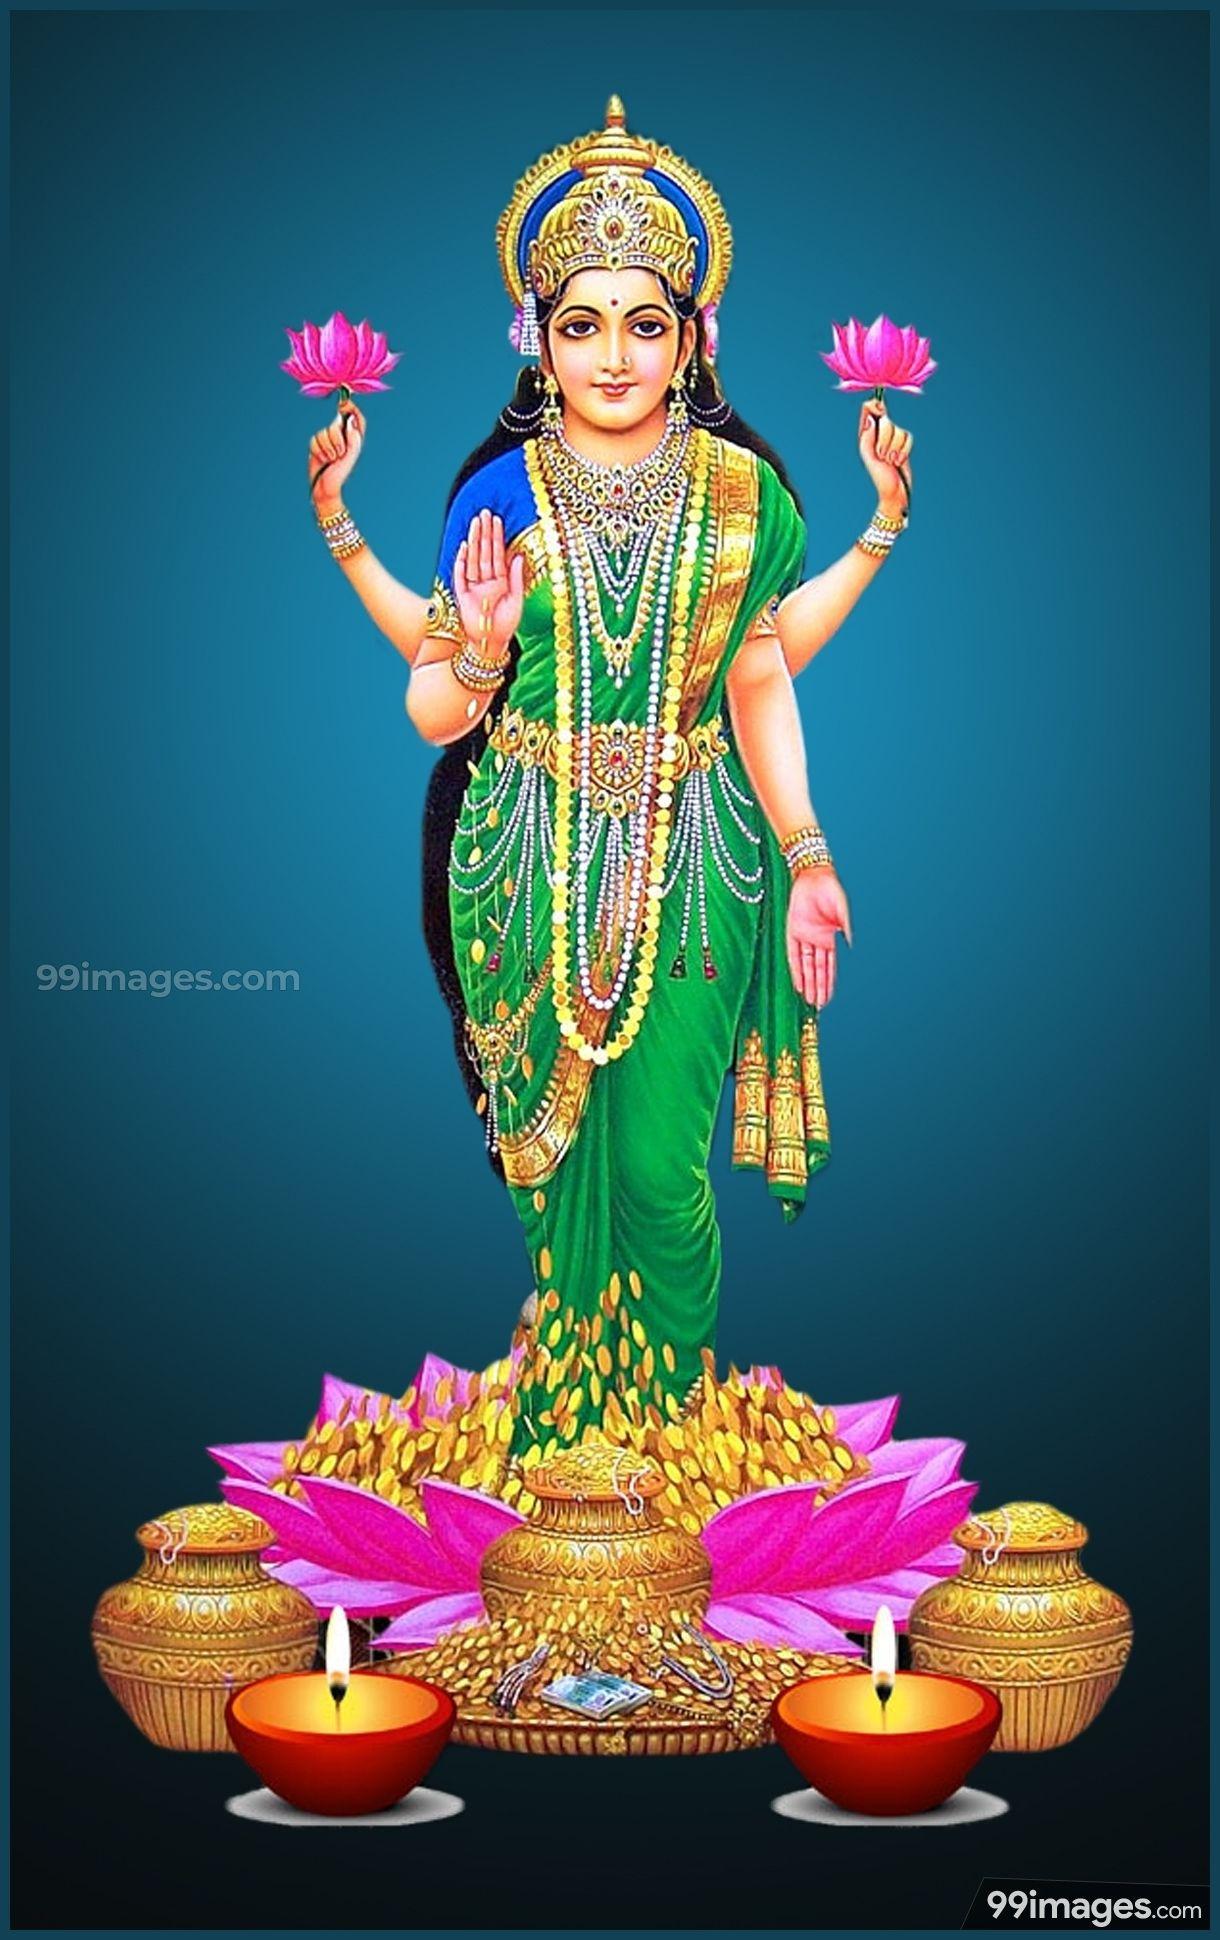 Goddess Lakshmi Best Hd Photos 1080p With Images Goddess Lakshmi Lakshmi Images Hindu Gods